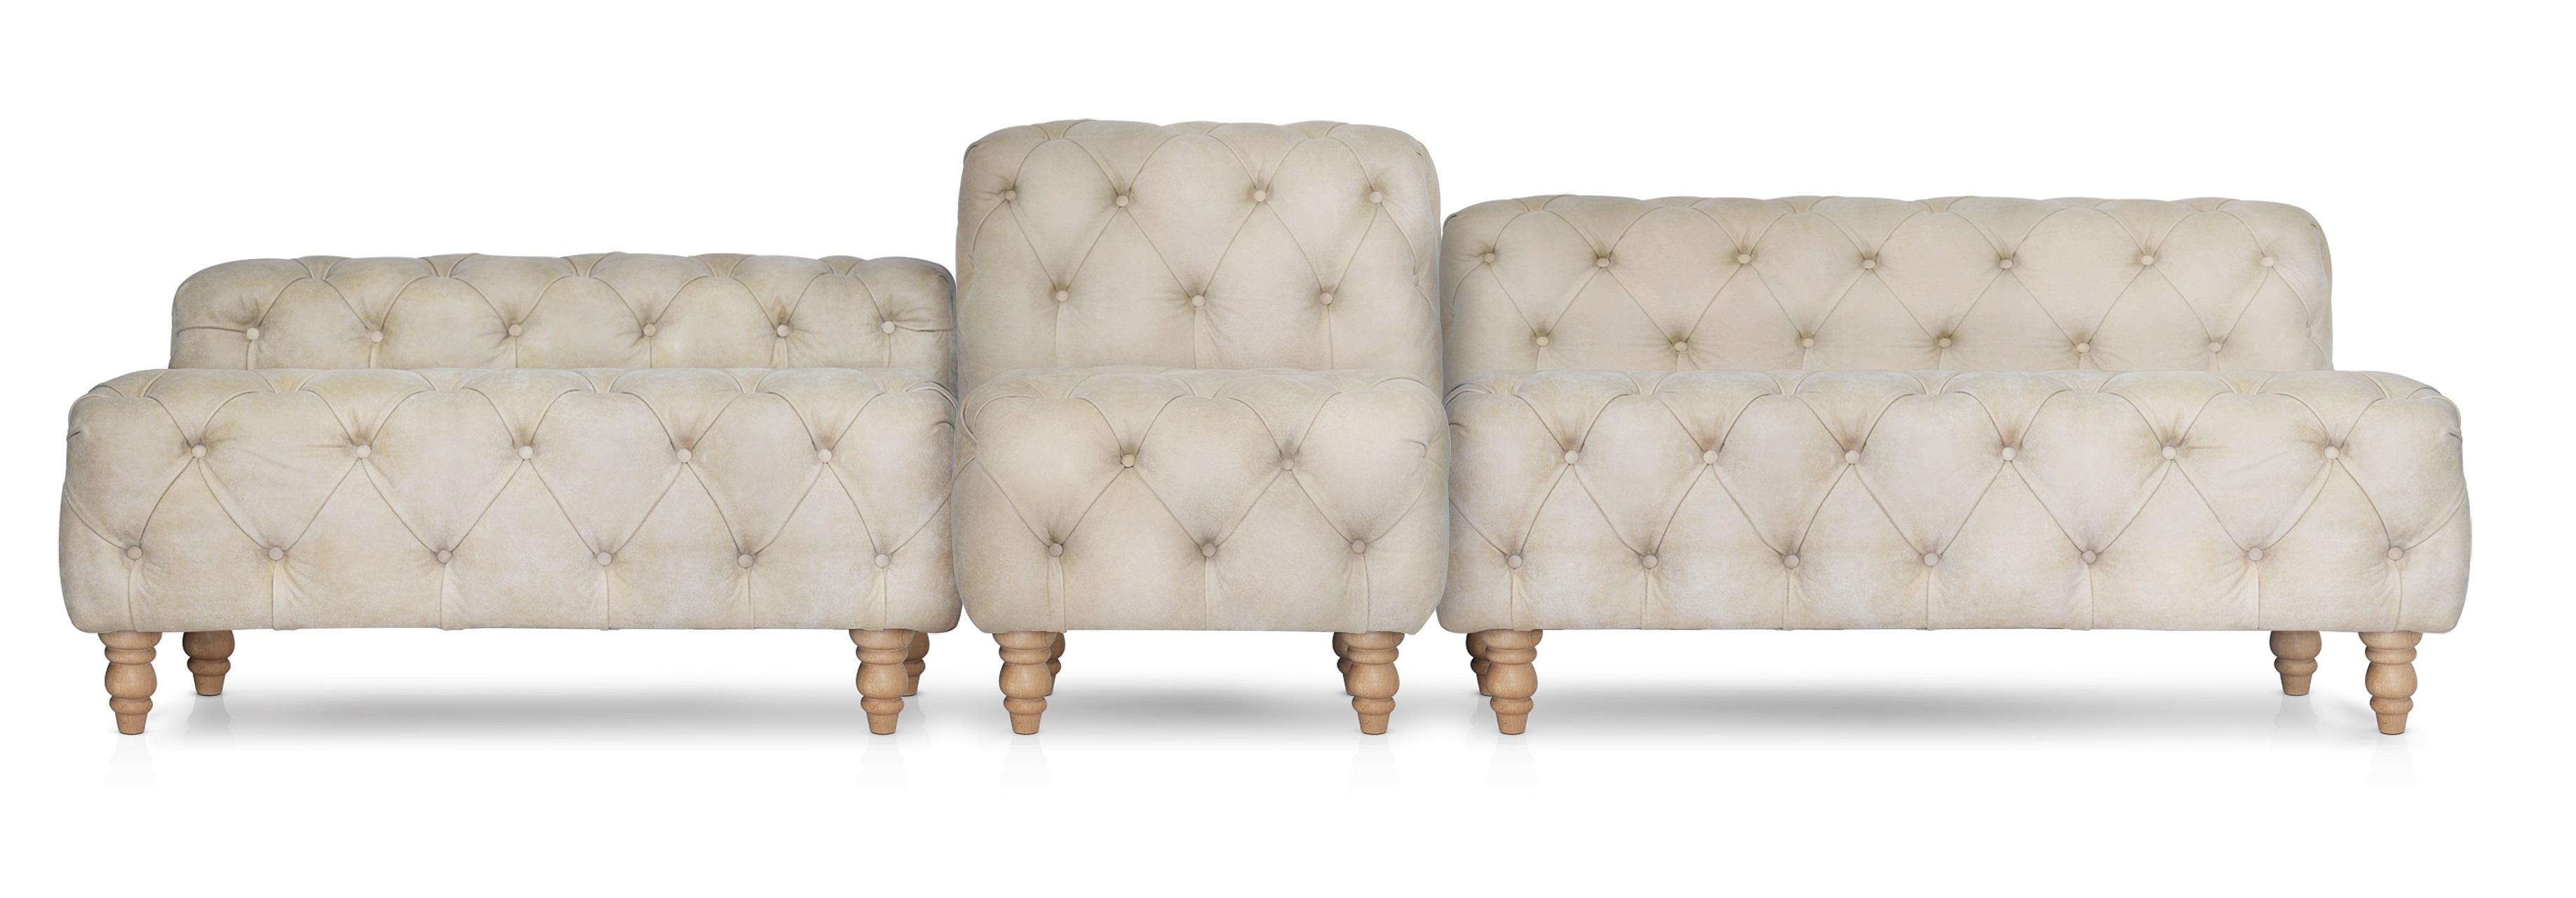 Miss chester soffa